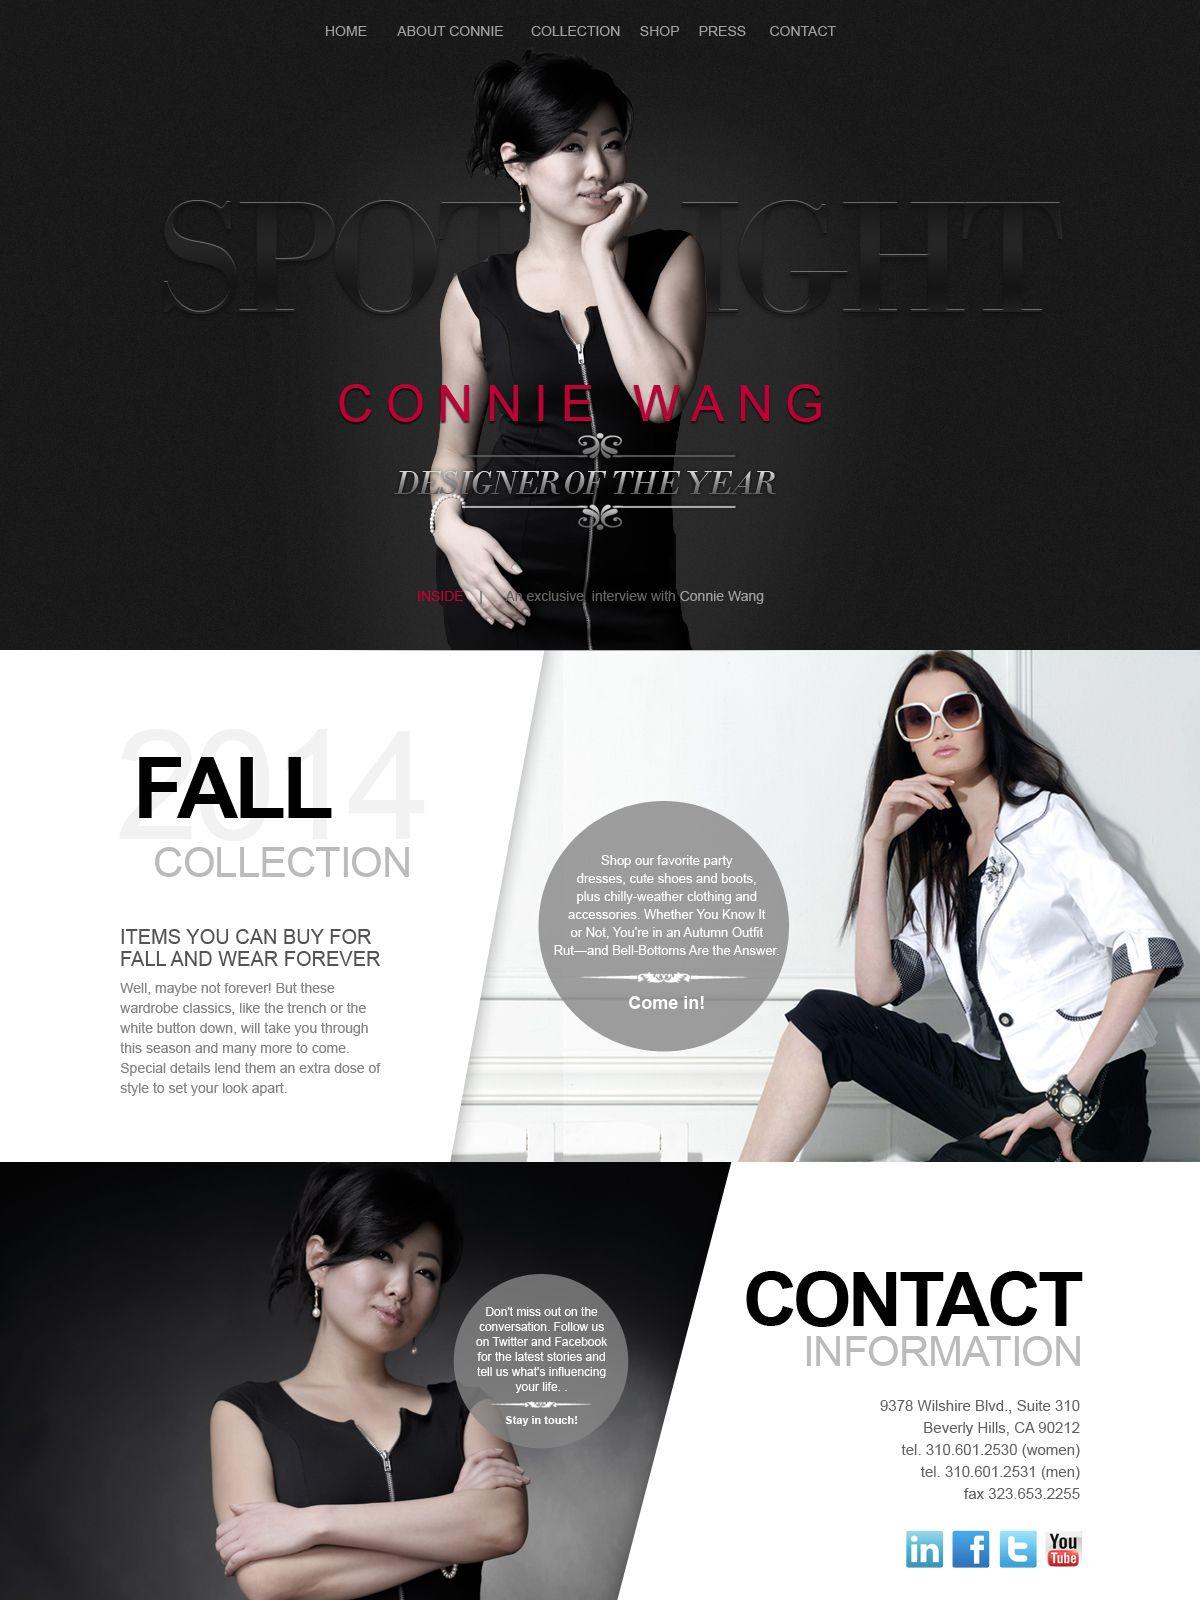 Fashion Website Design Inspiration | Brand Building | Pinterest